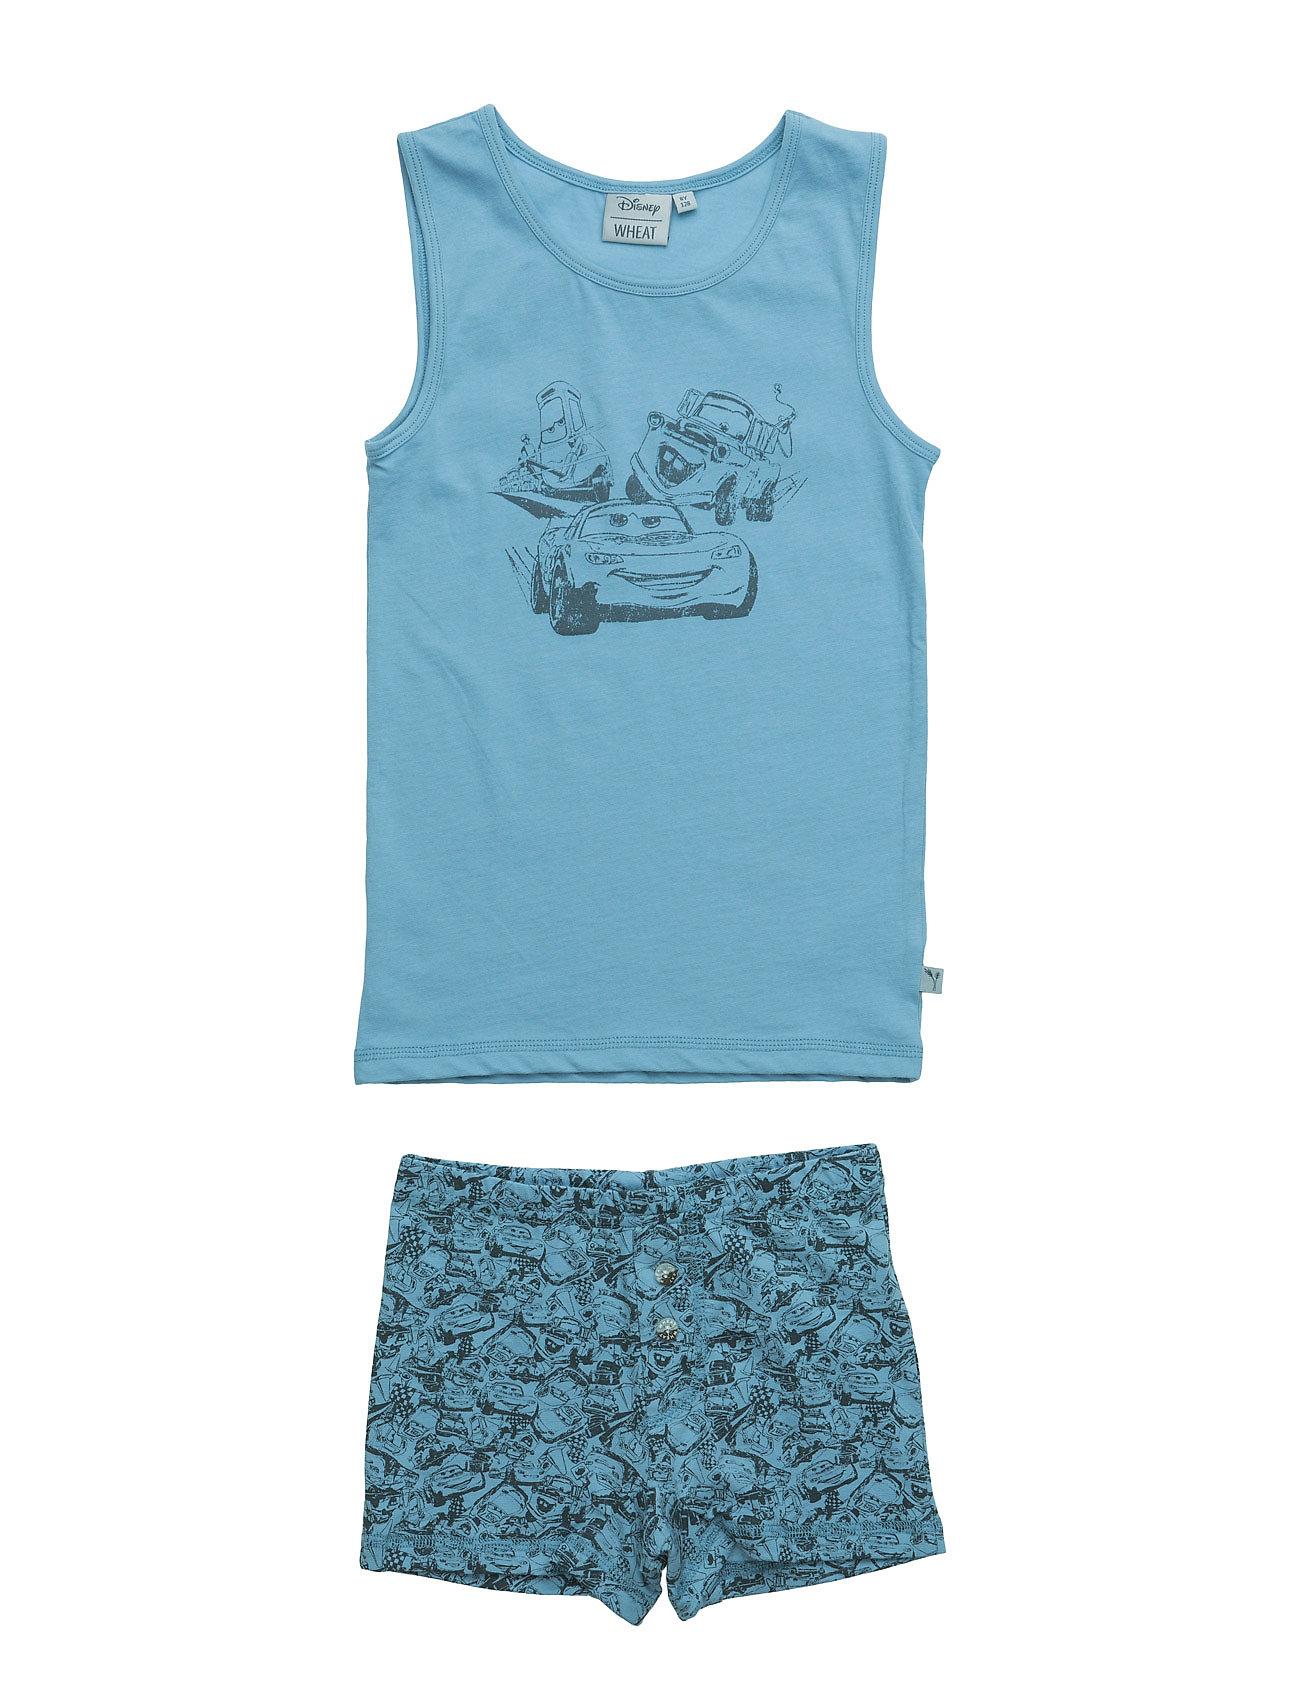 Boy Underwear Cars Disney by Wheat Undertøj til Børn i Ashley Blå